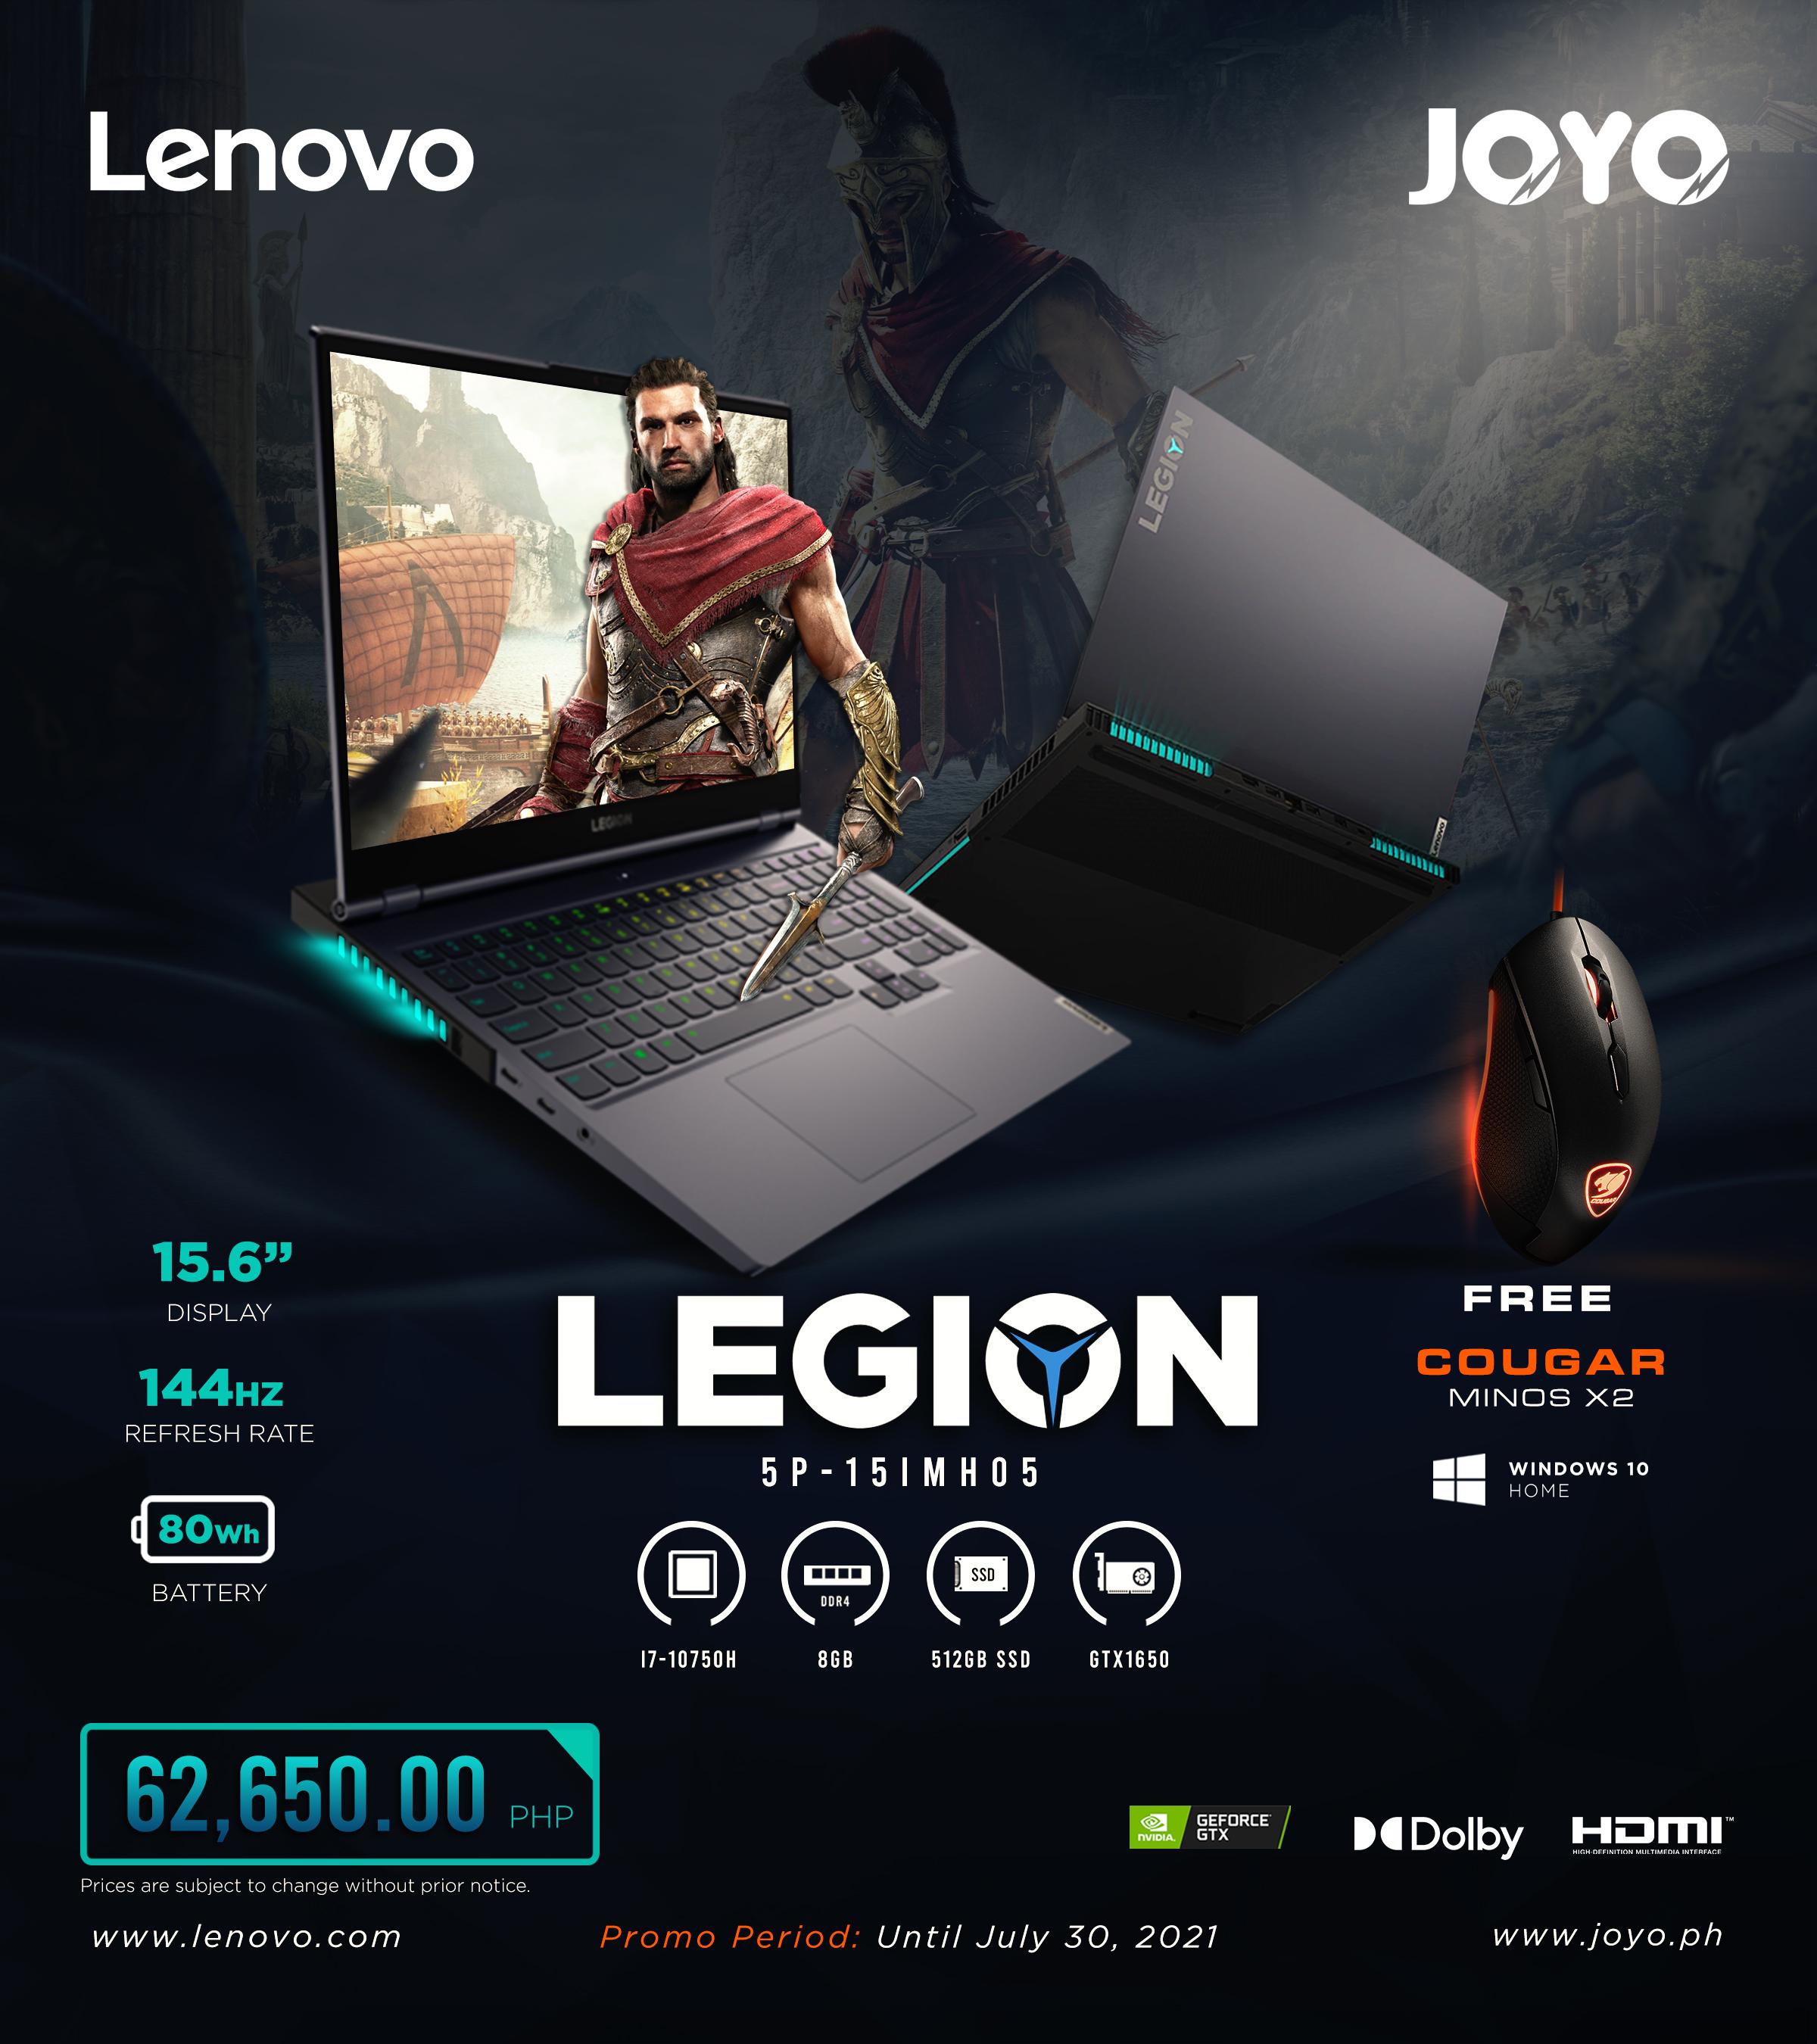 LENOVO LEGION 5P-15IMH05 82AY0 LAPTOP.jpg